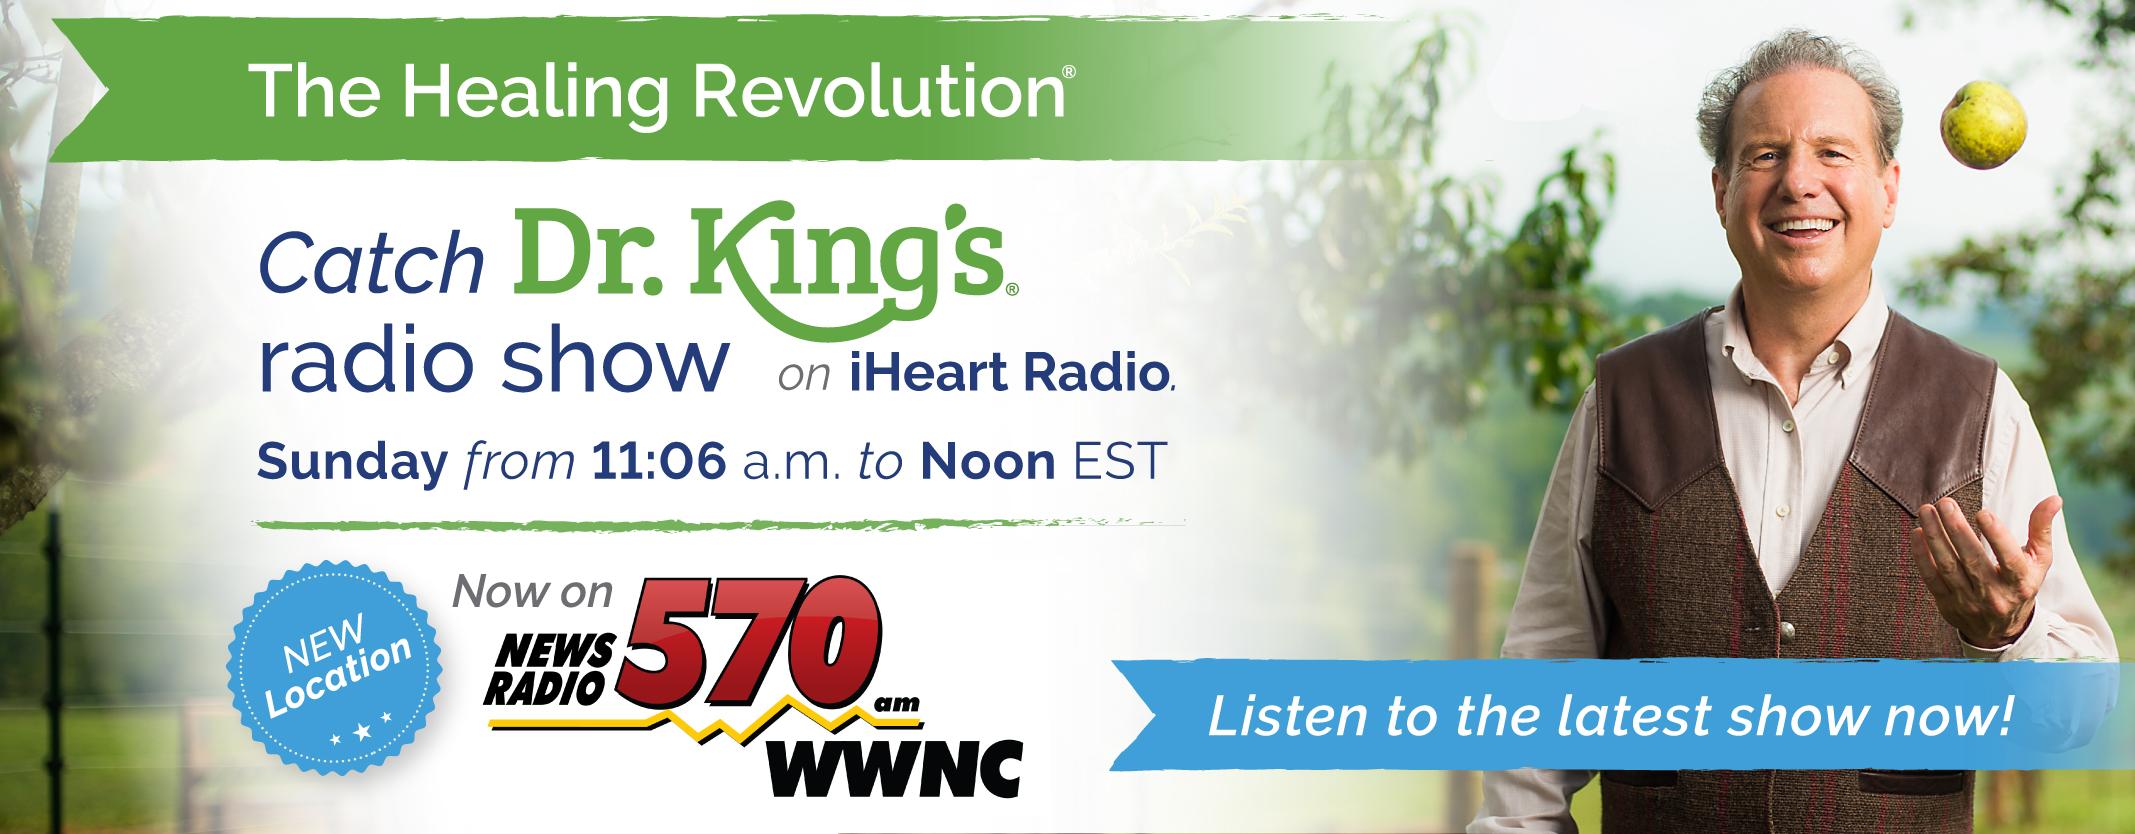 The Healing Revolution Radio Show